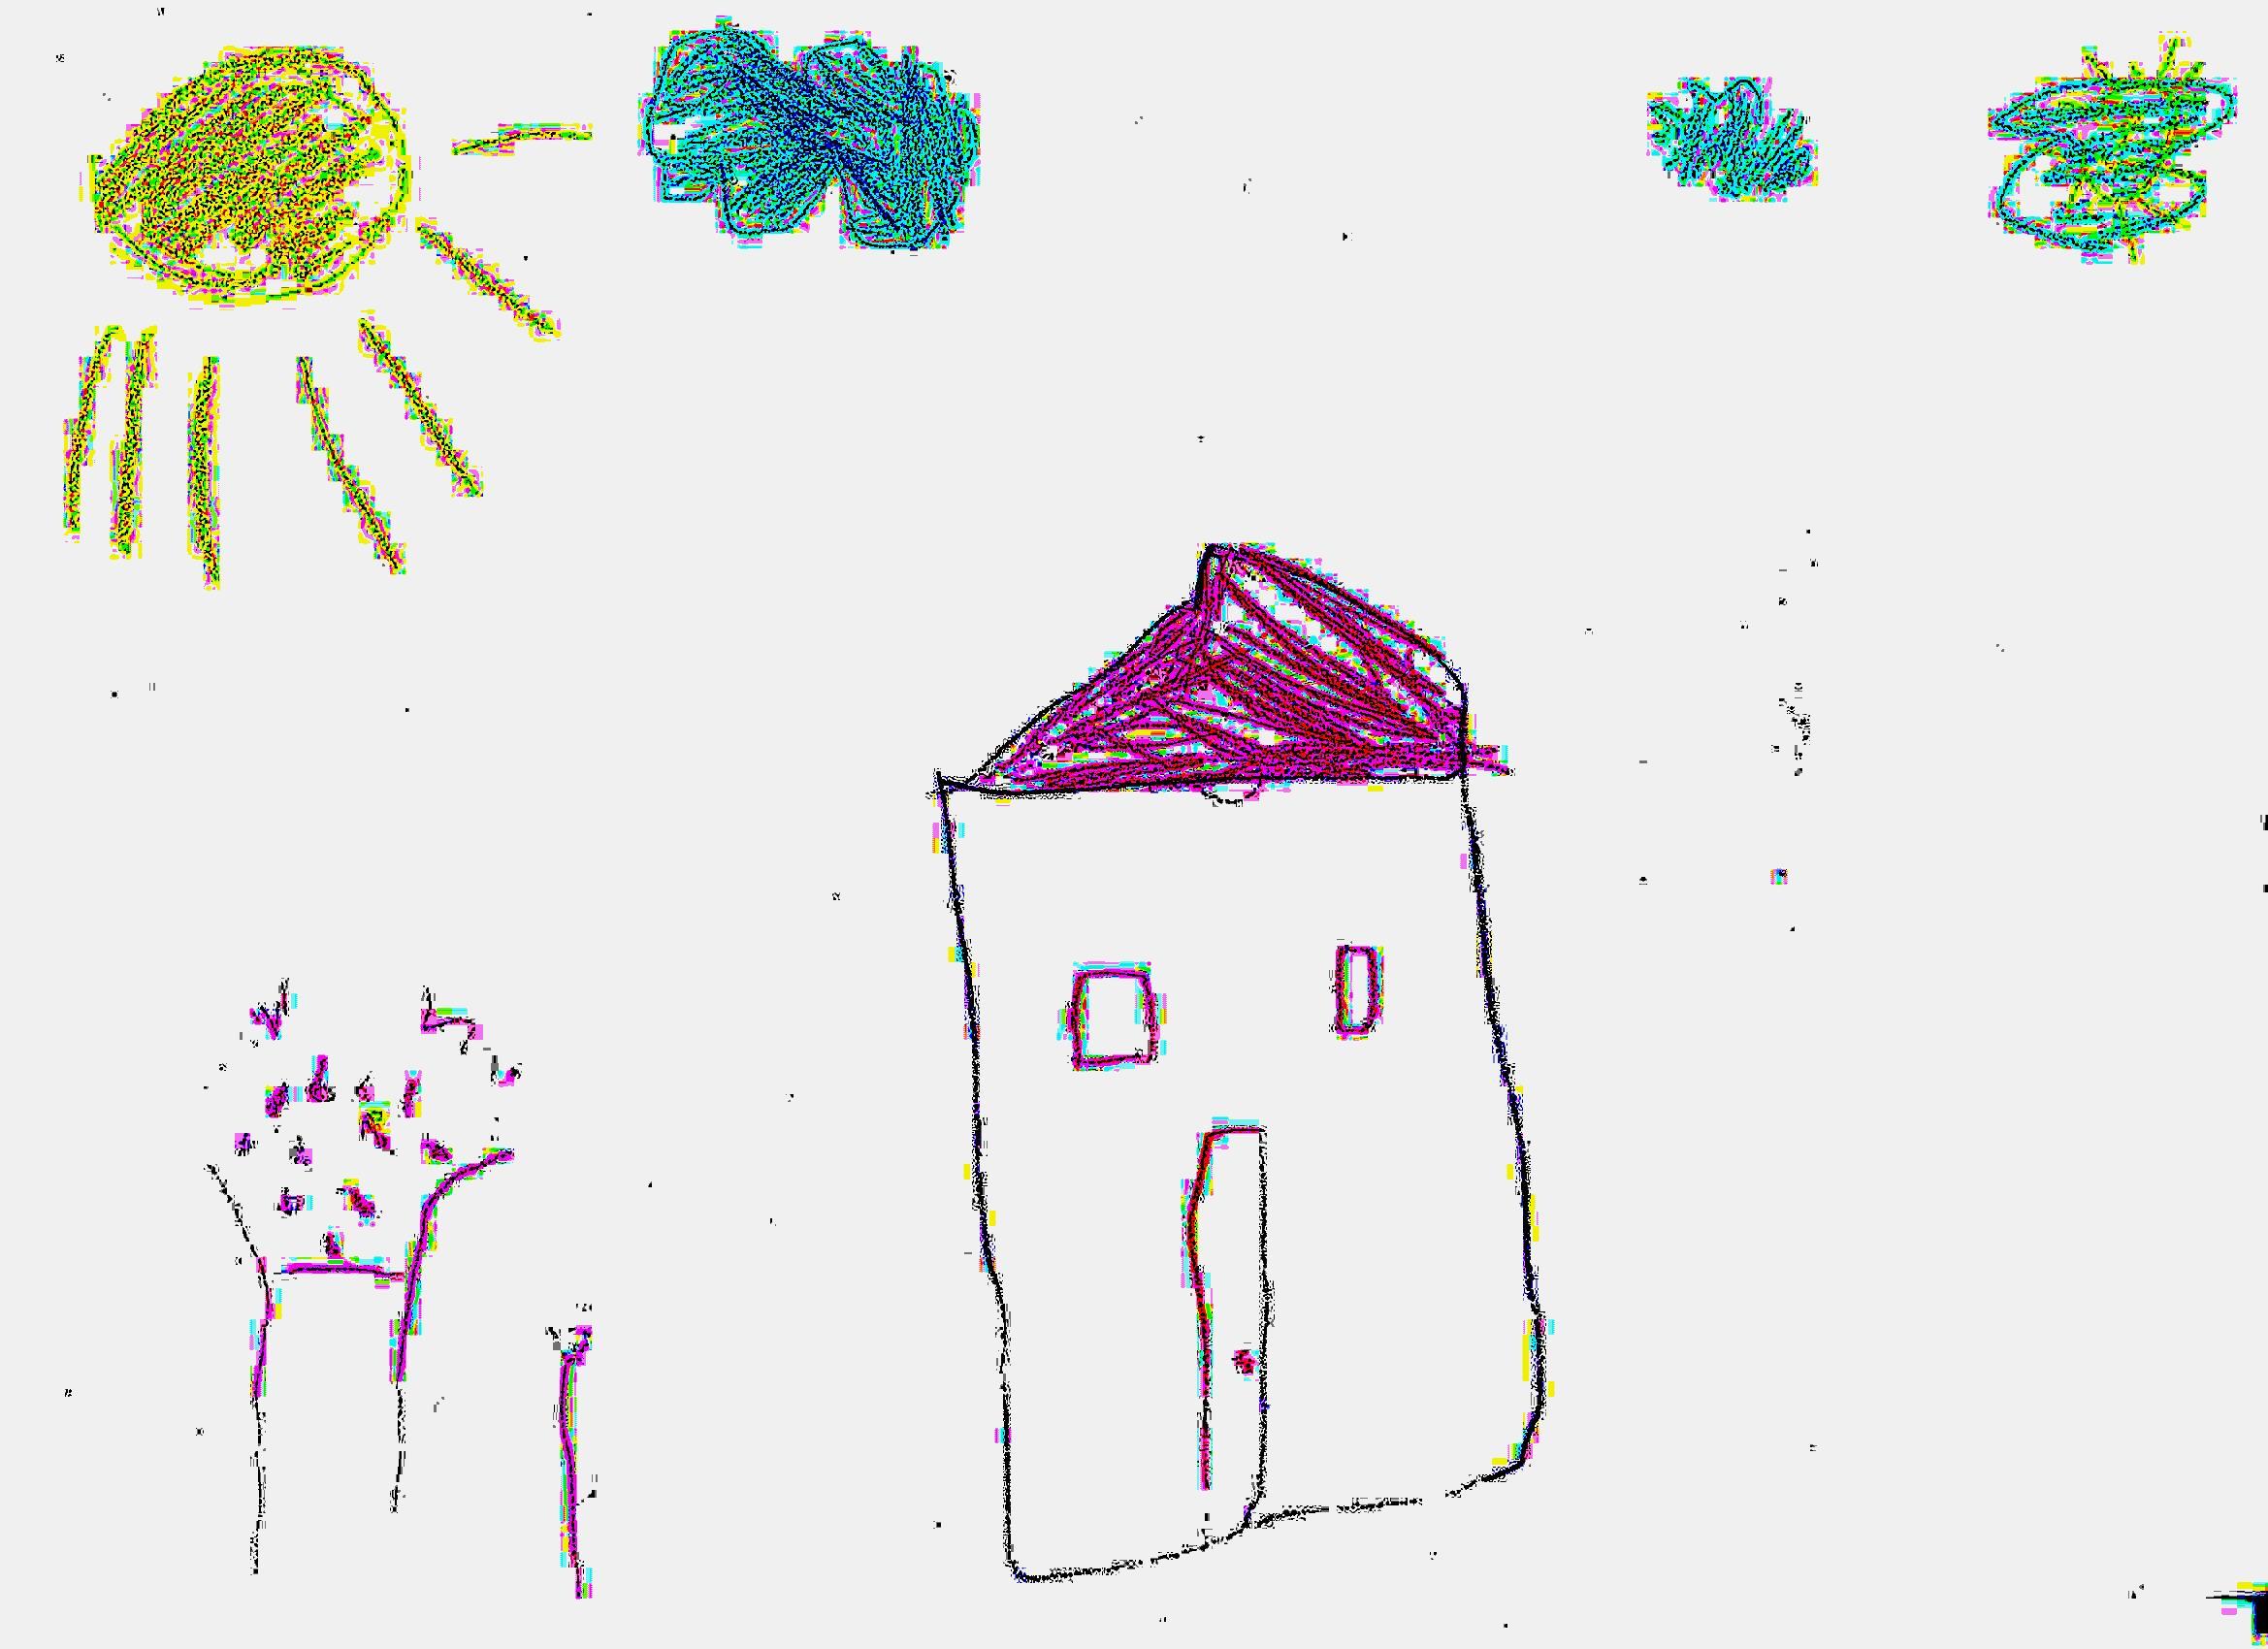 Hodánics Anna-Mária rajza